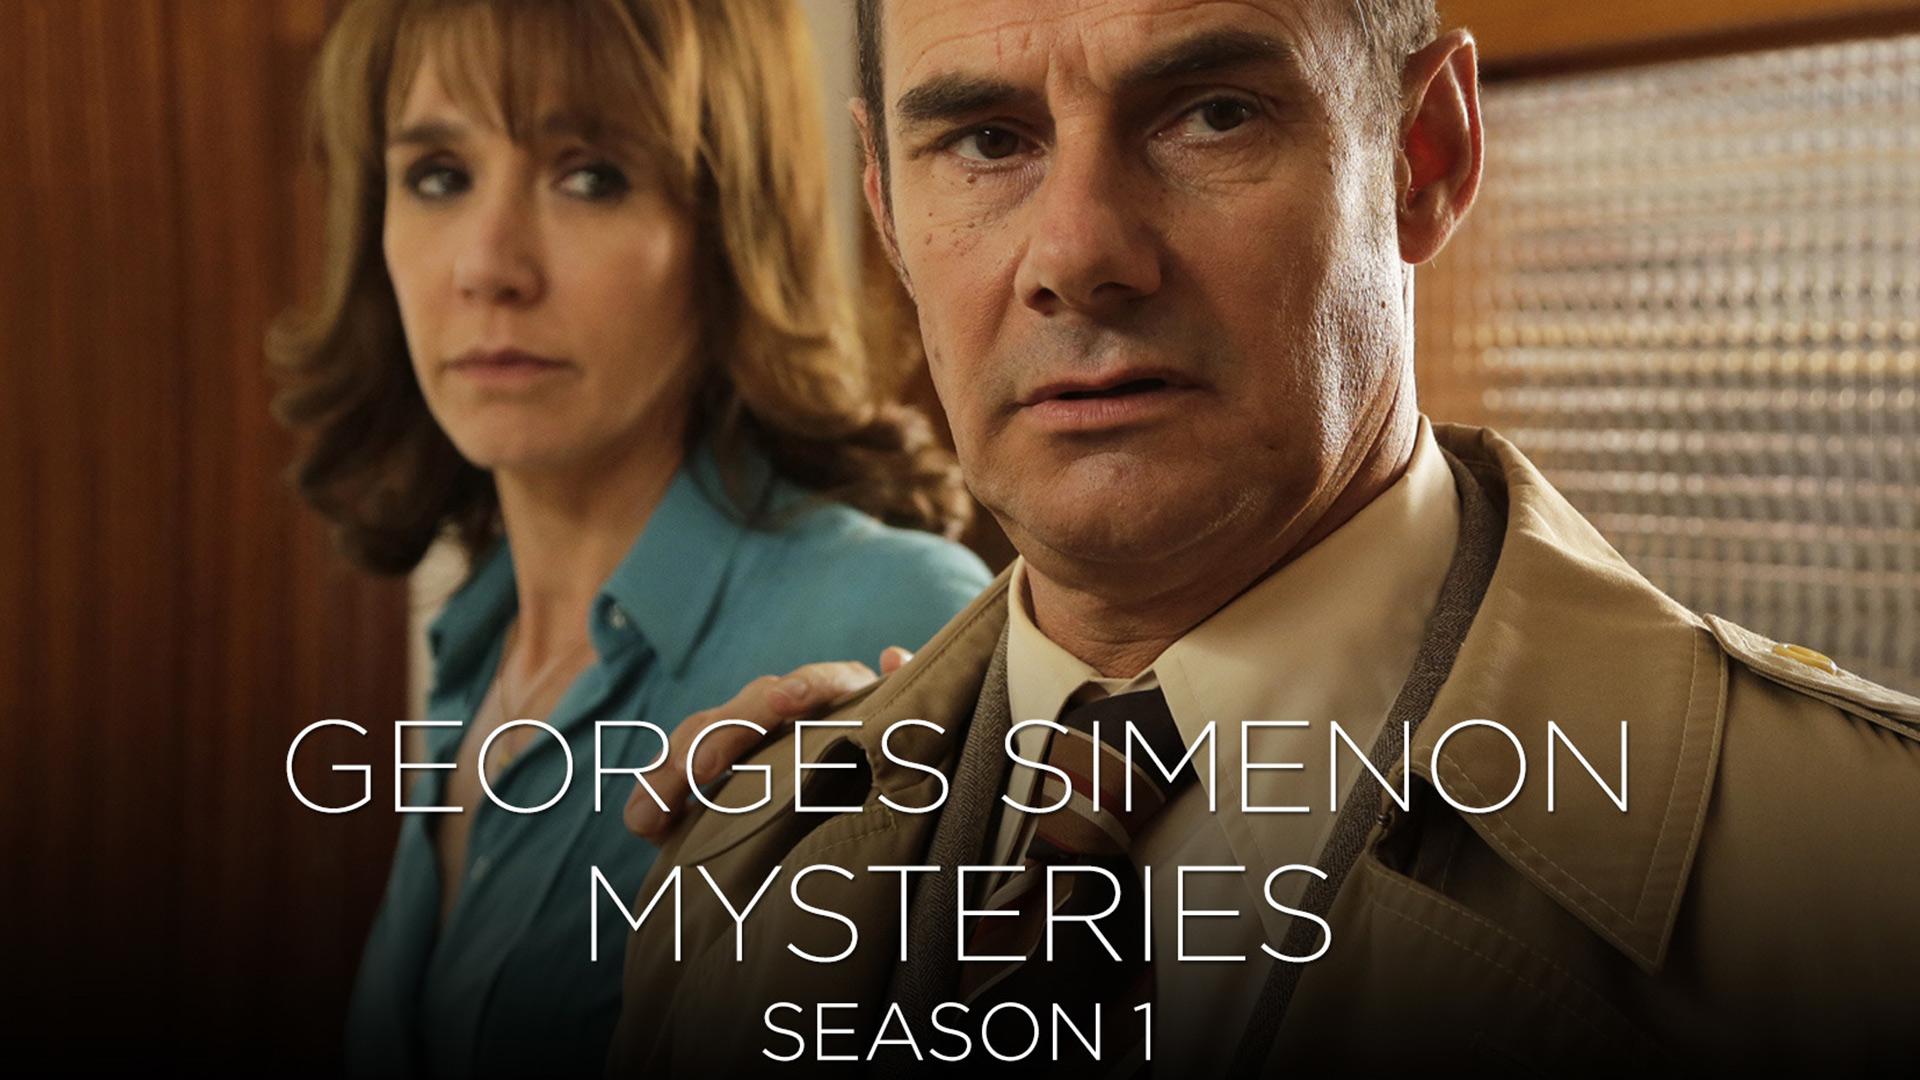 Georges Simenon Mysteries